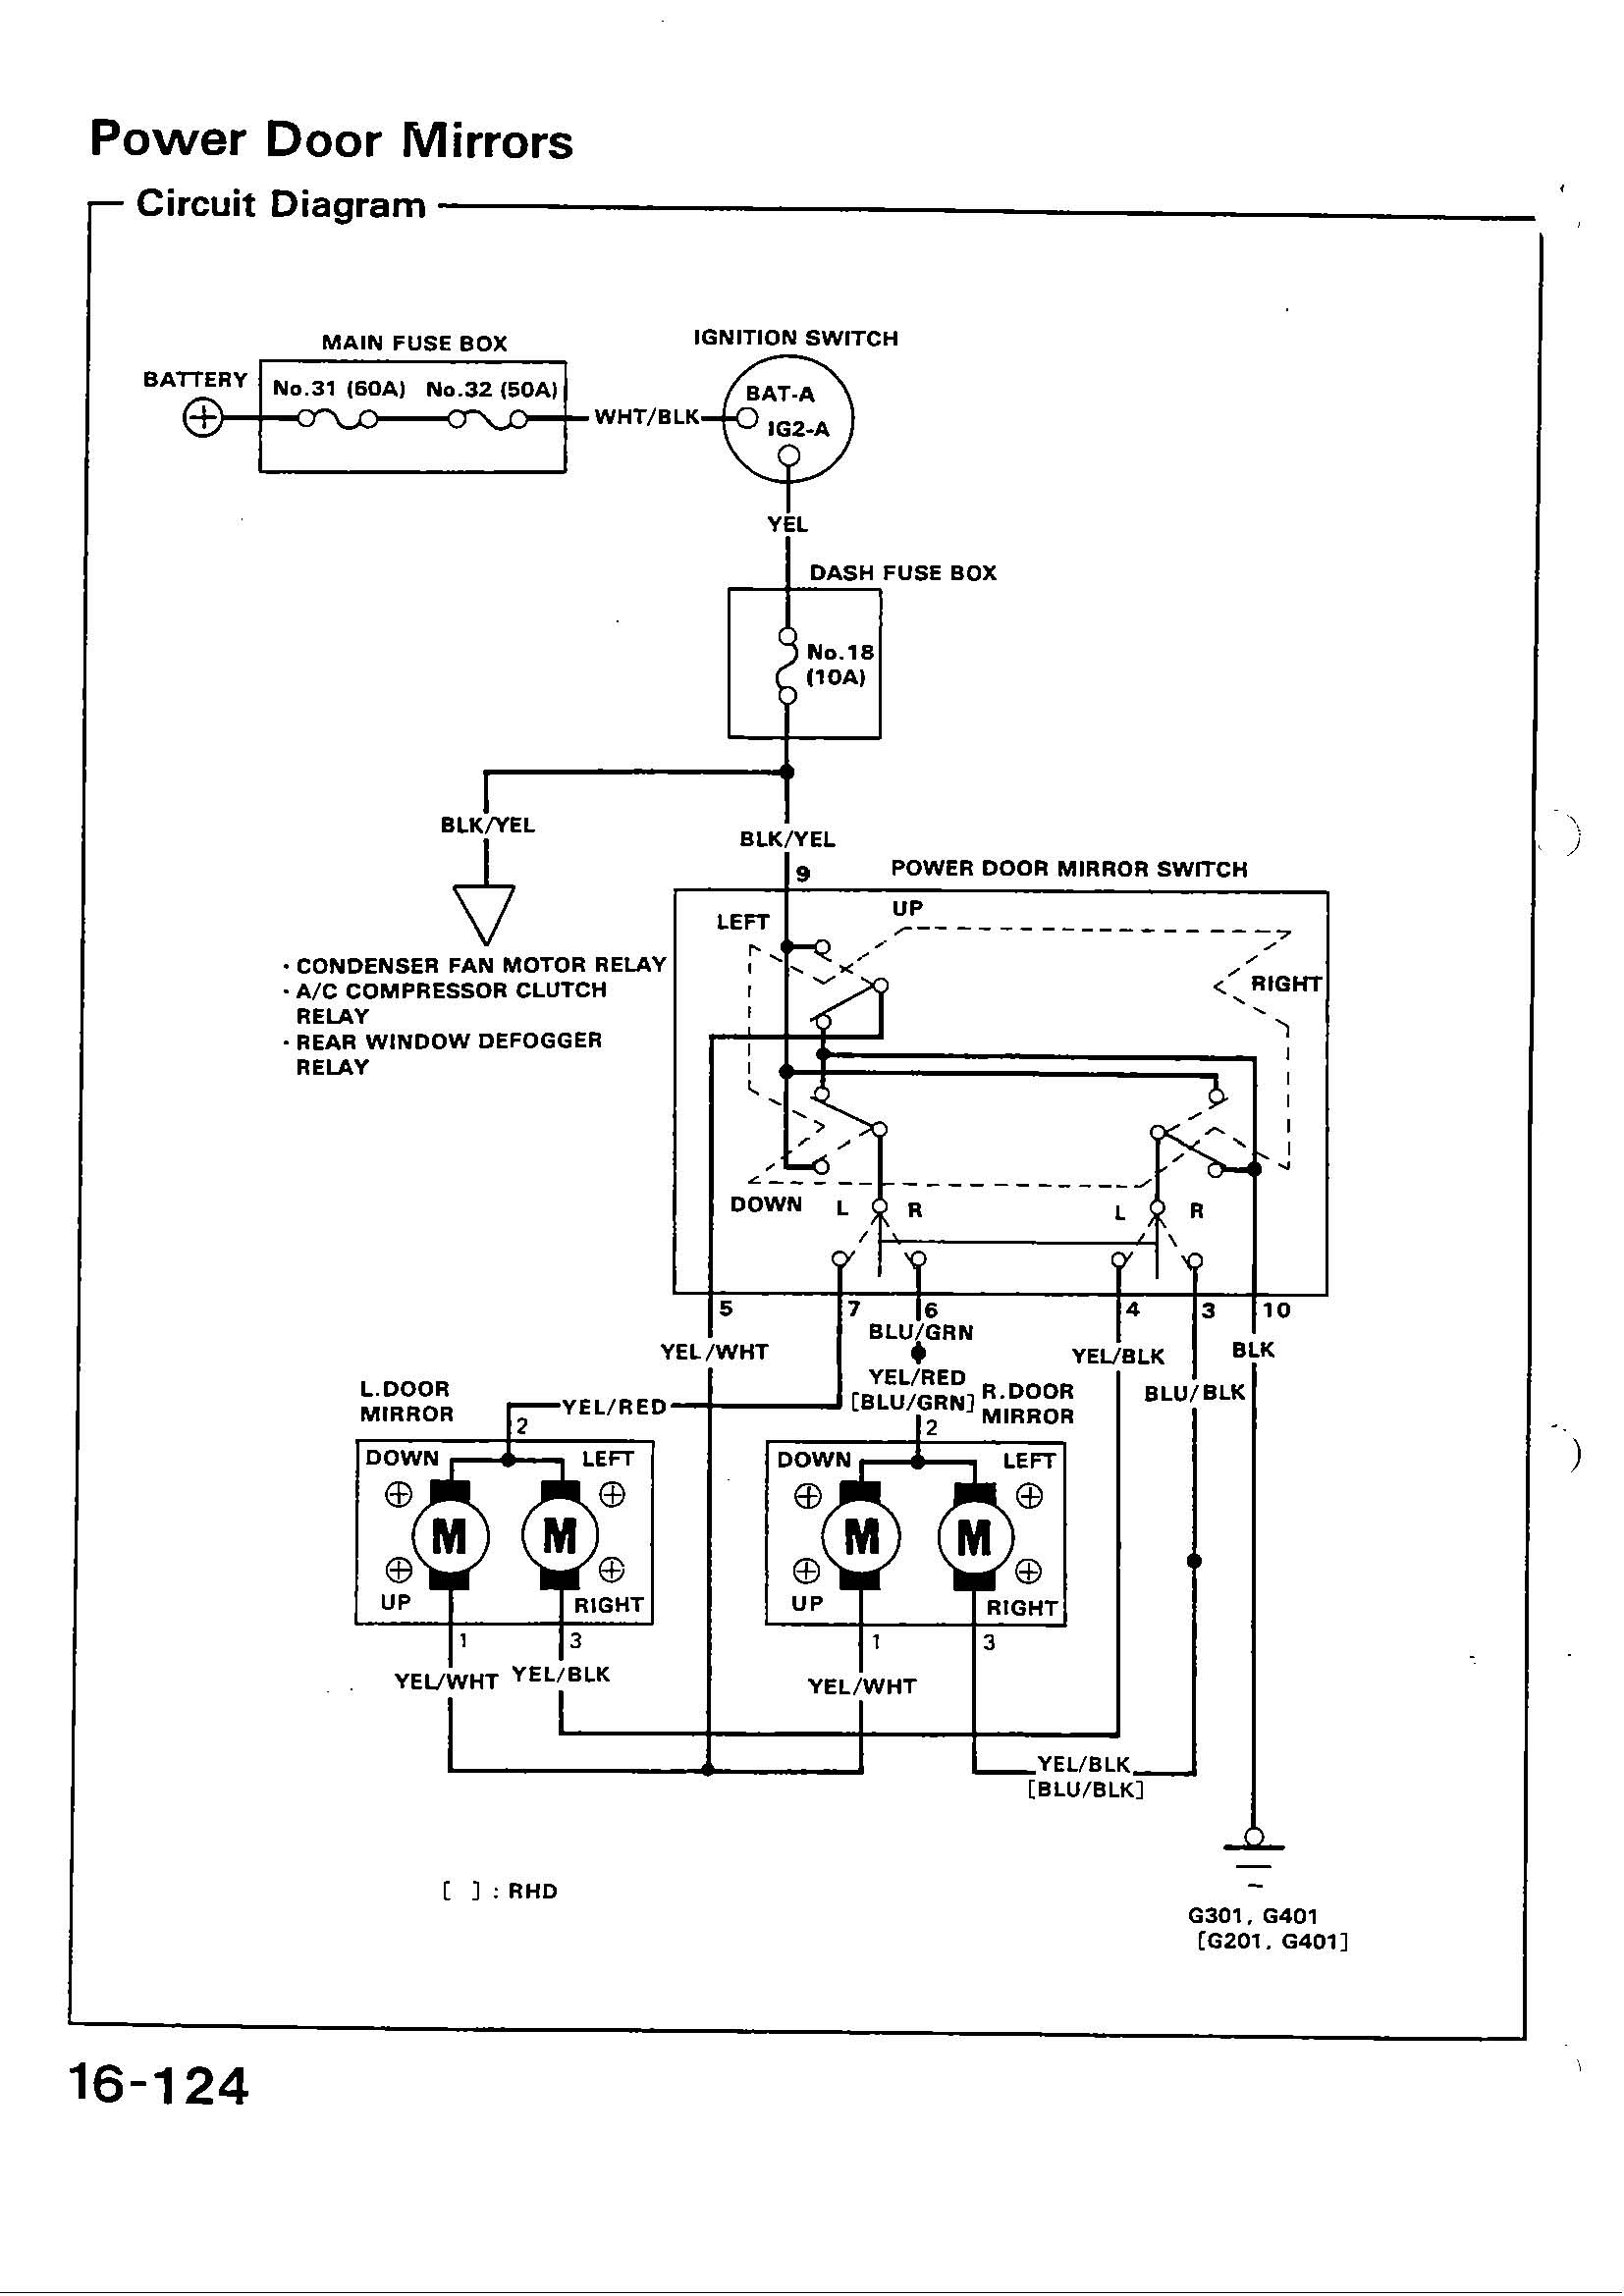 91CIVICPOWERMIRRORS?resize=665%2C940 diagrams 10001121 crx wiring diagram repair guides wiring crx main relay wiring diagram at fashall.co